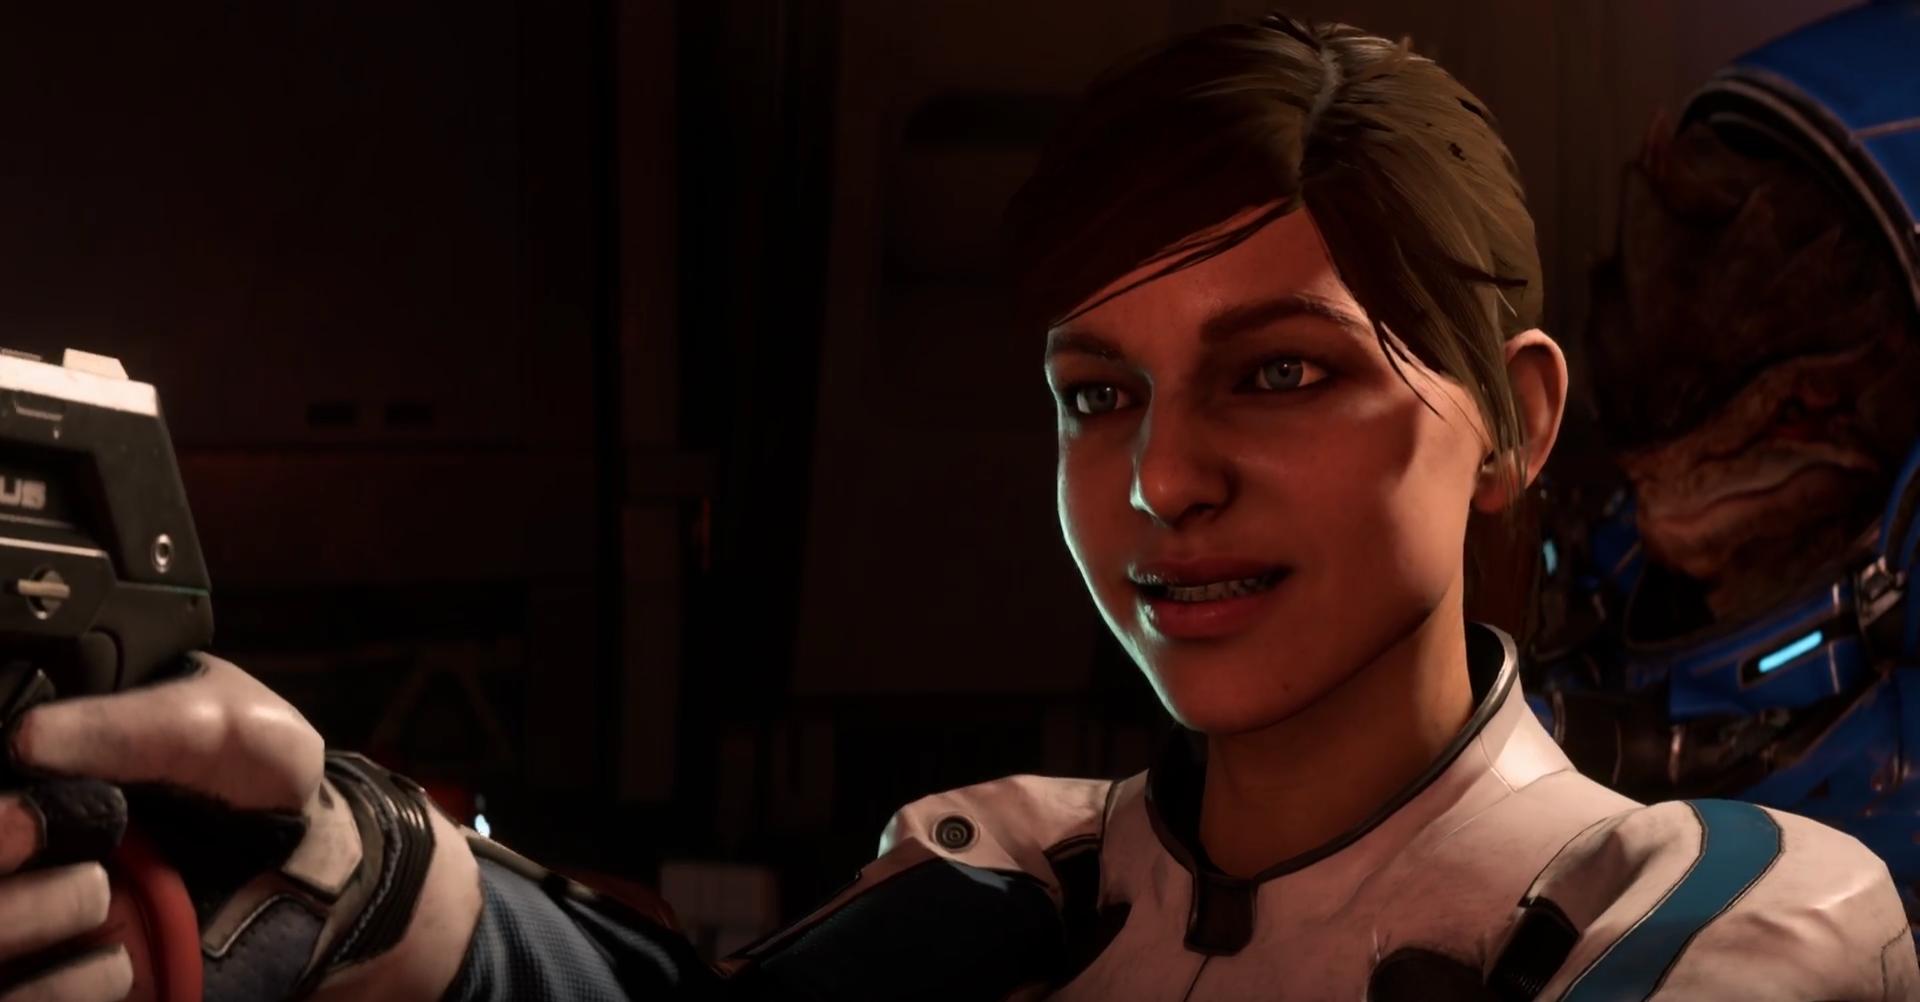 Mass Effect Andromeda avra una storia autoconclusiva